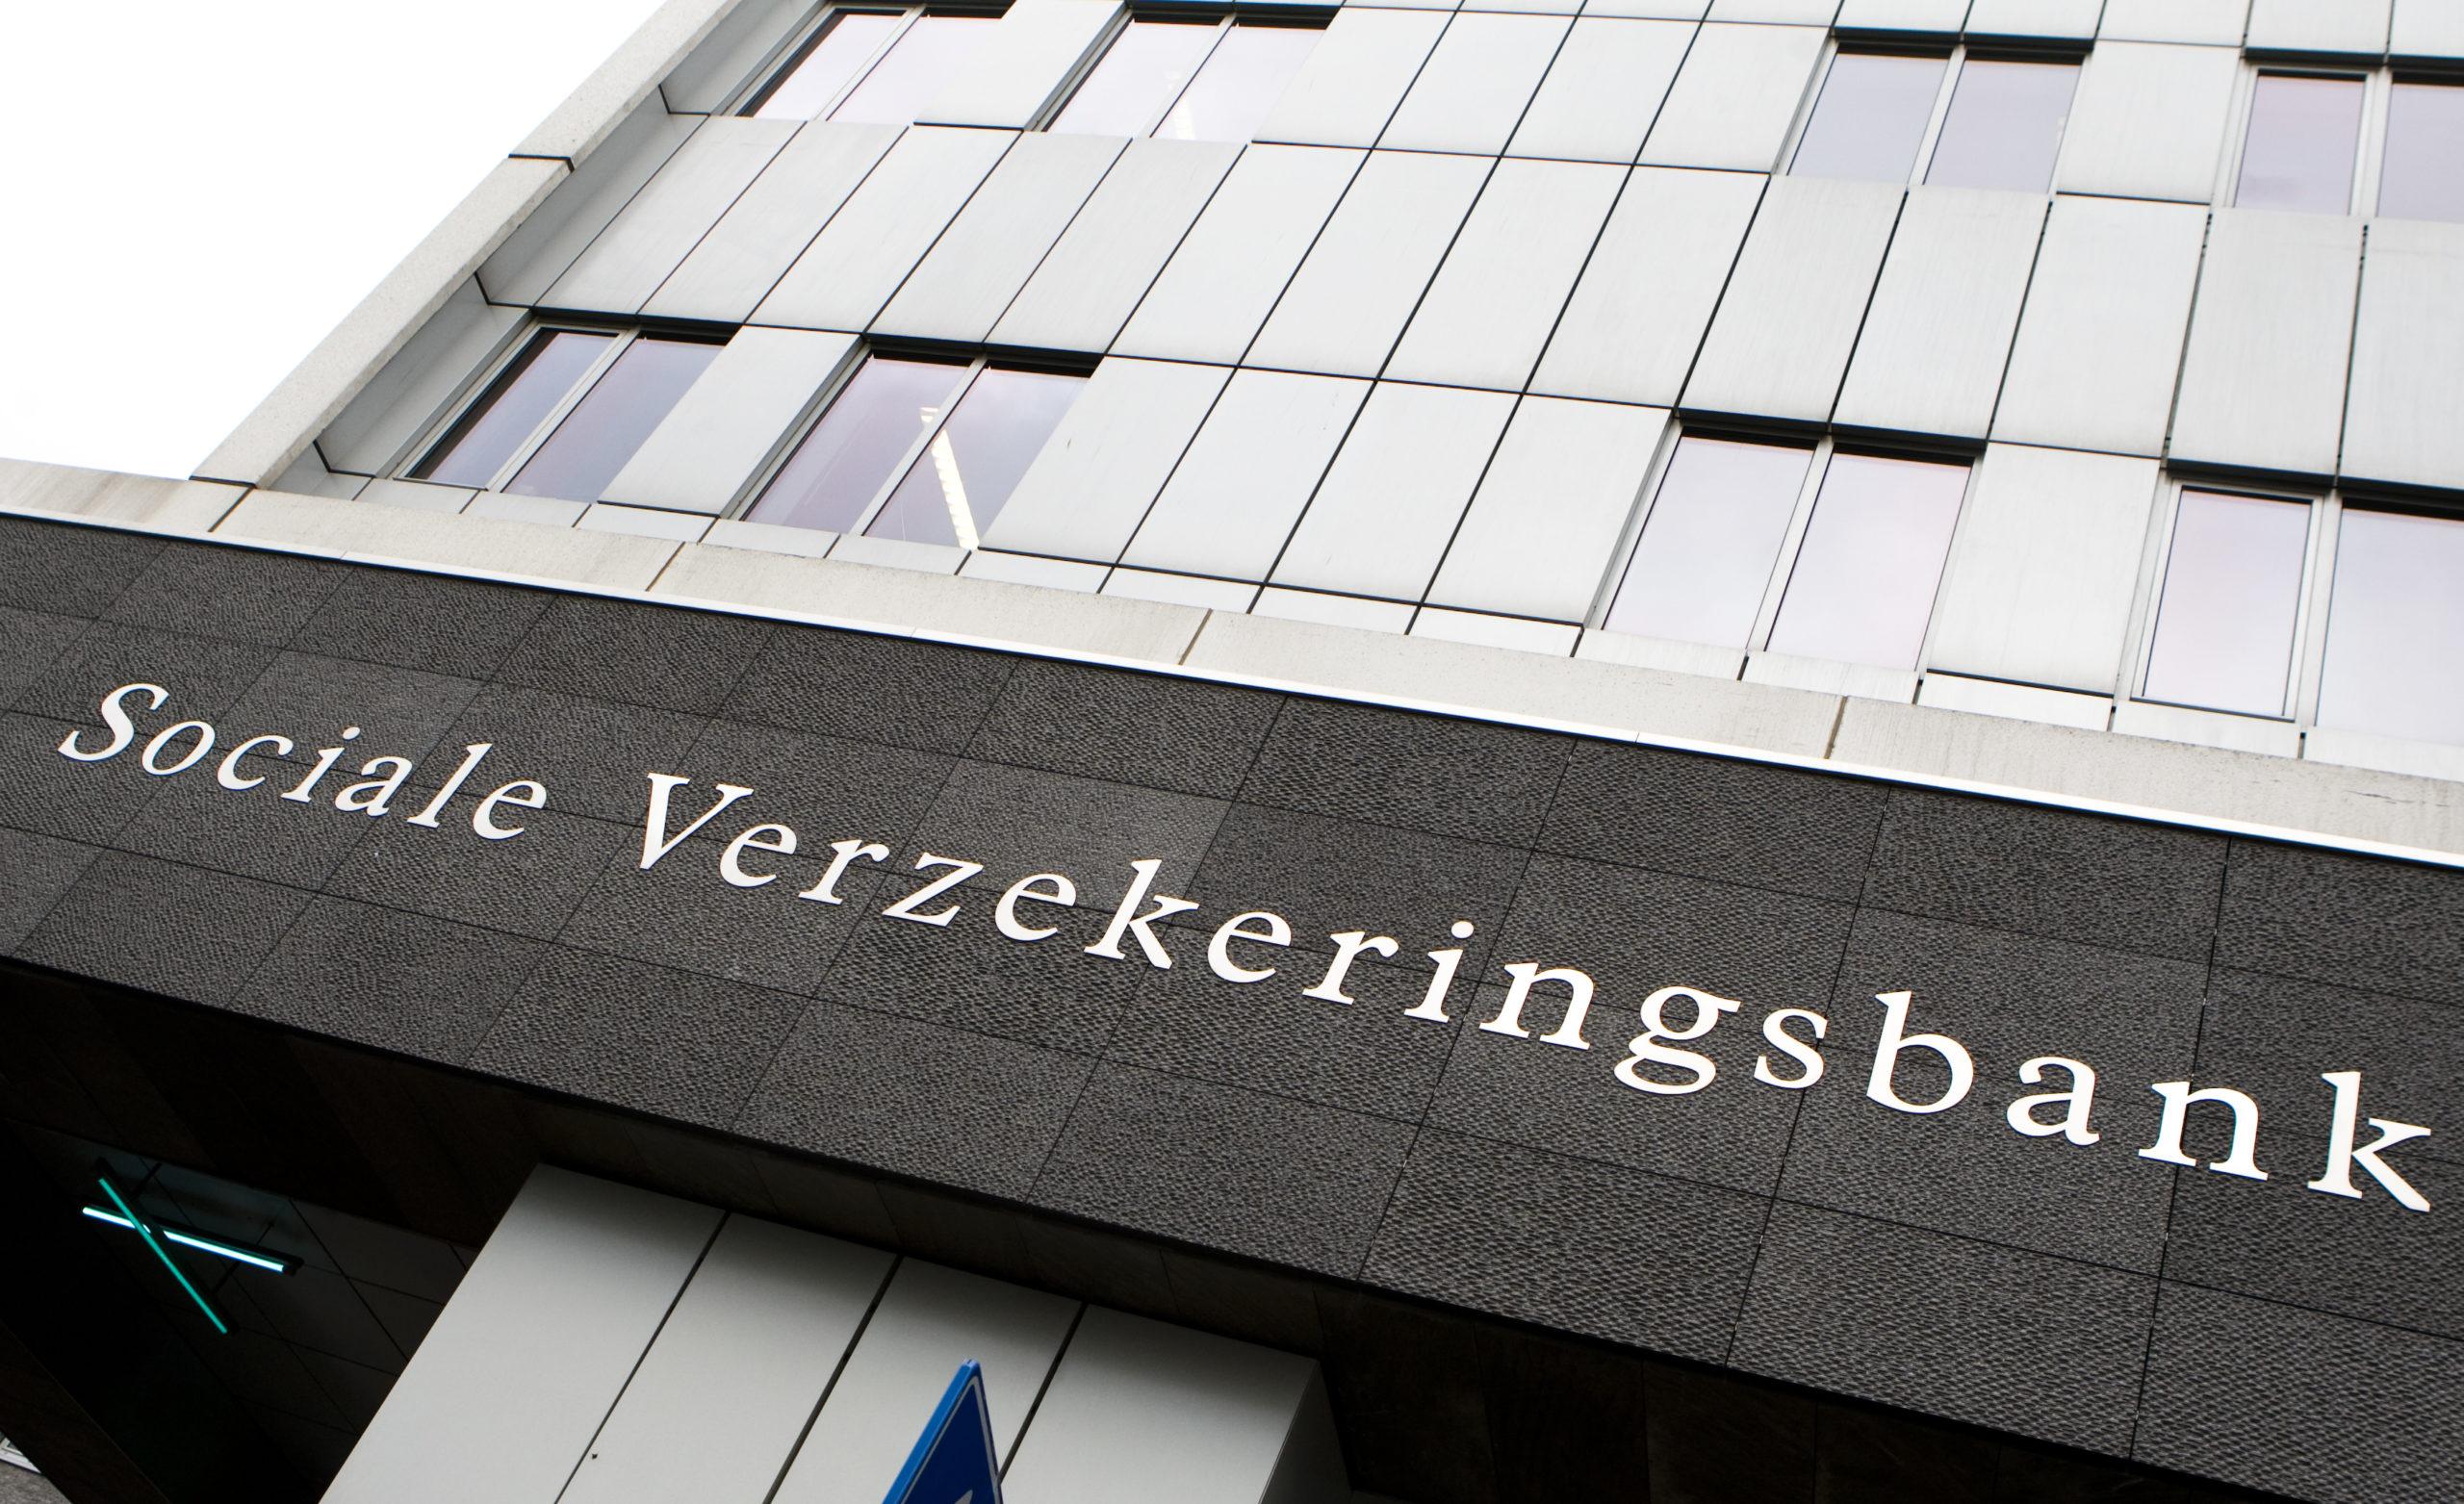 Sociale Verzekeringsbank - Portfolio